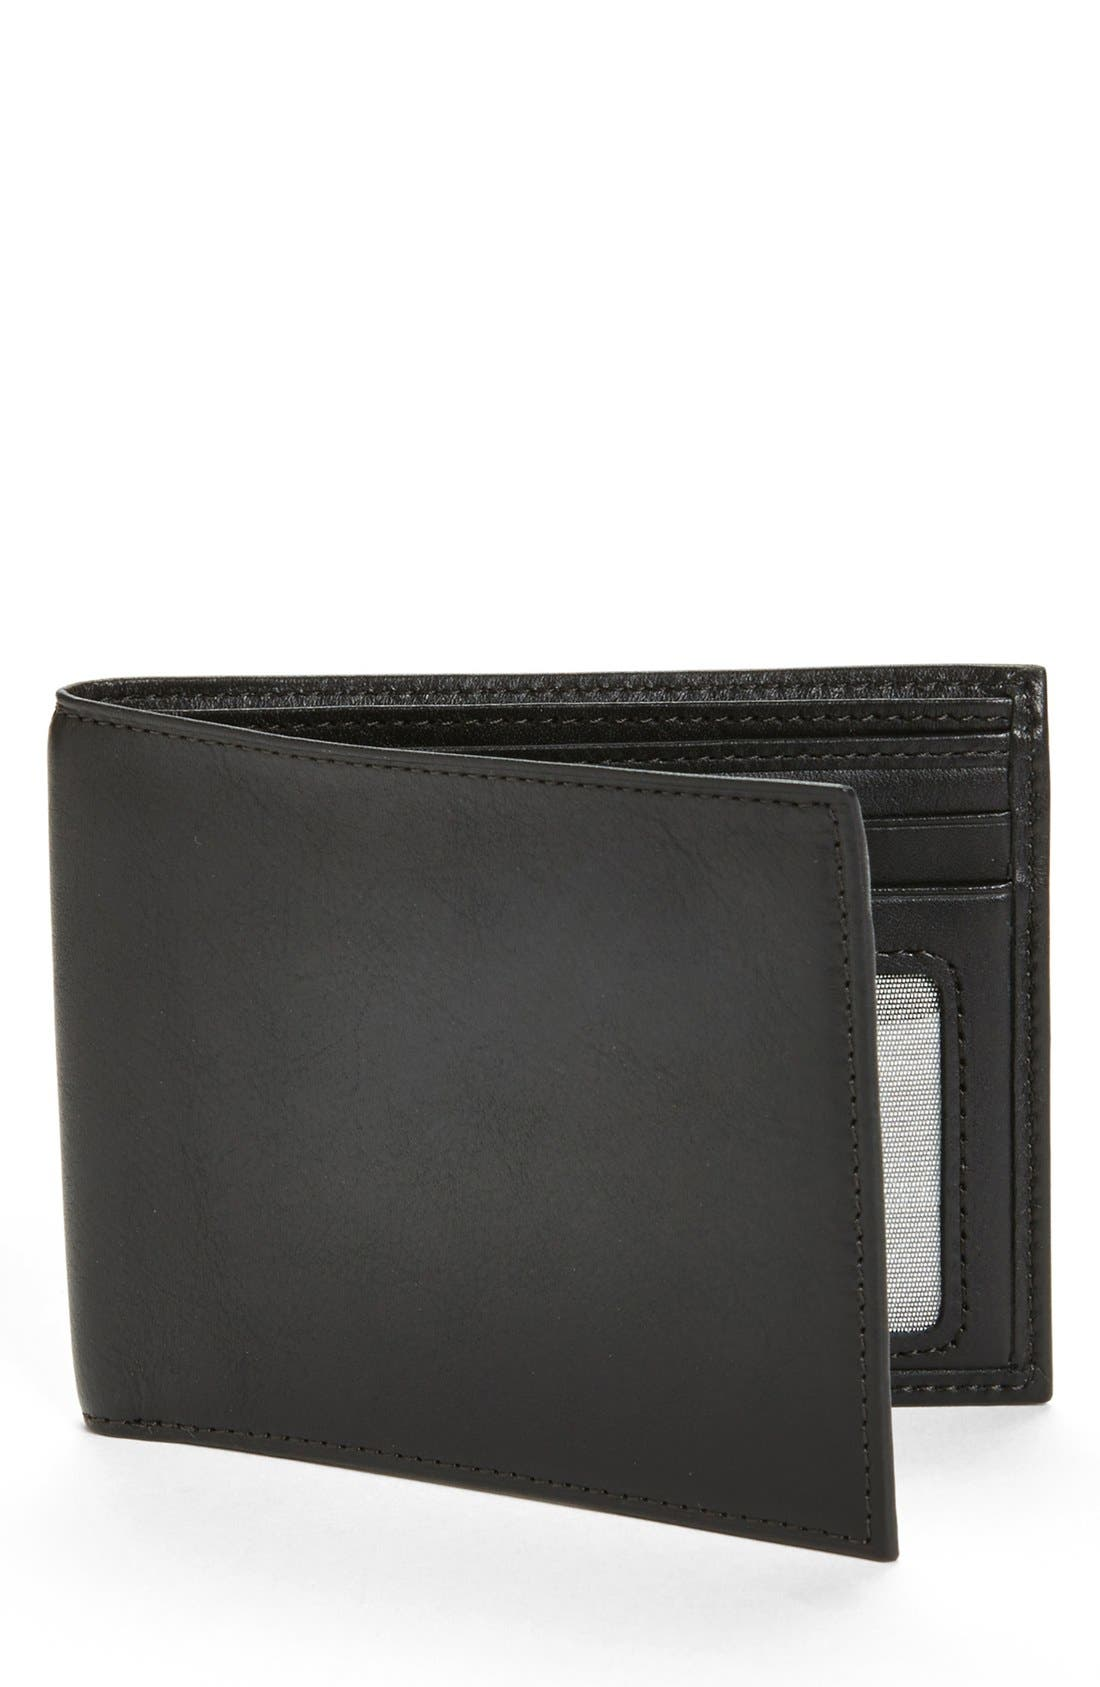 'Executive ID' Nappa Leather Wallet,                             Main thumbnail 1, color,                             BLACK